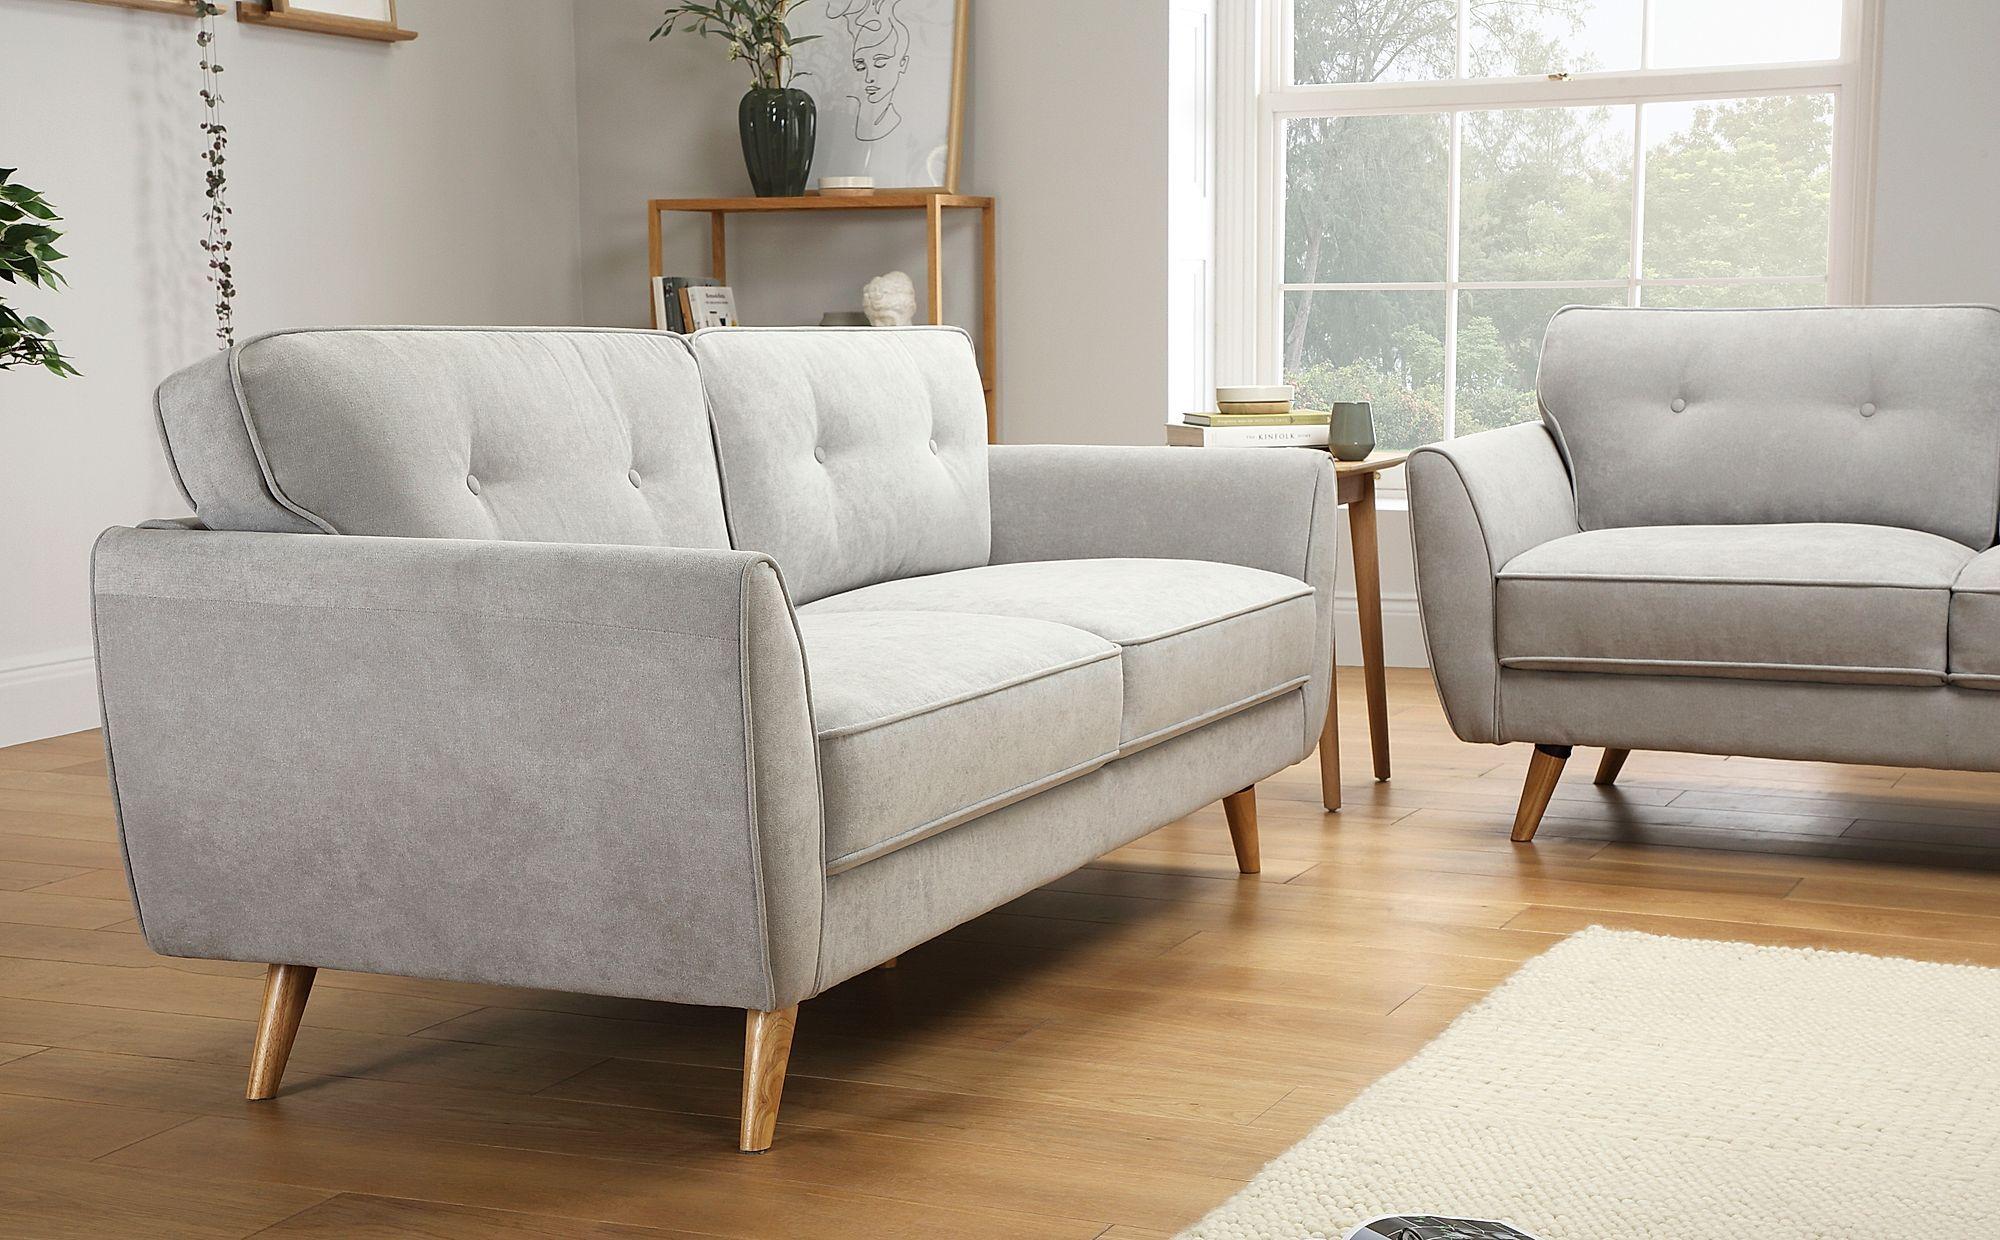 Harlow Dove Grey Plush Fabric 3 Seater Sofa Furniture Choice In 2020 Sofa Furniture Furniture Choice Seater Sofa